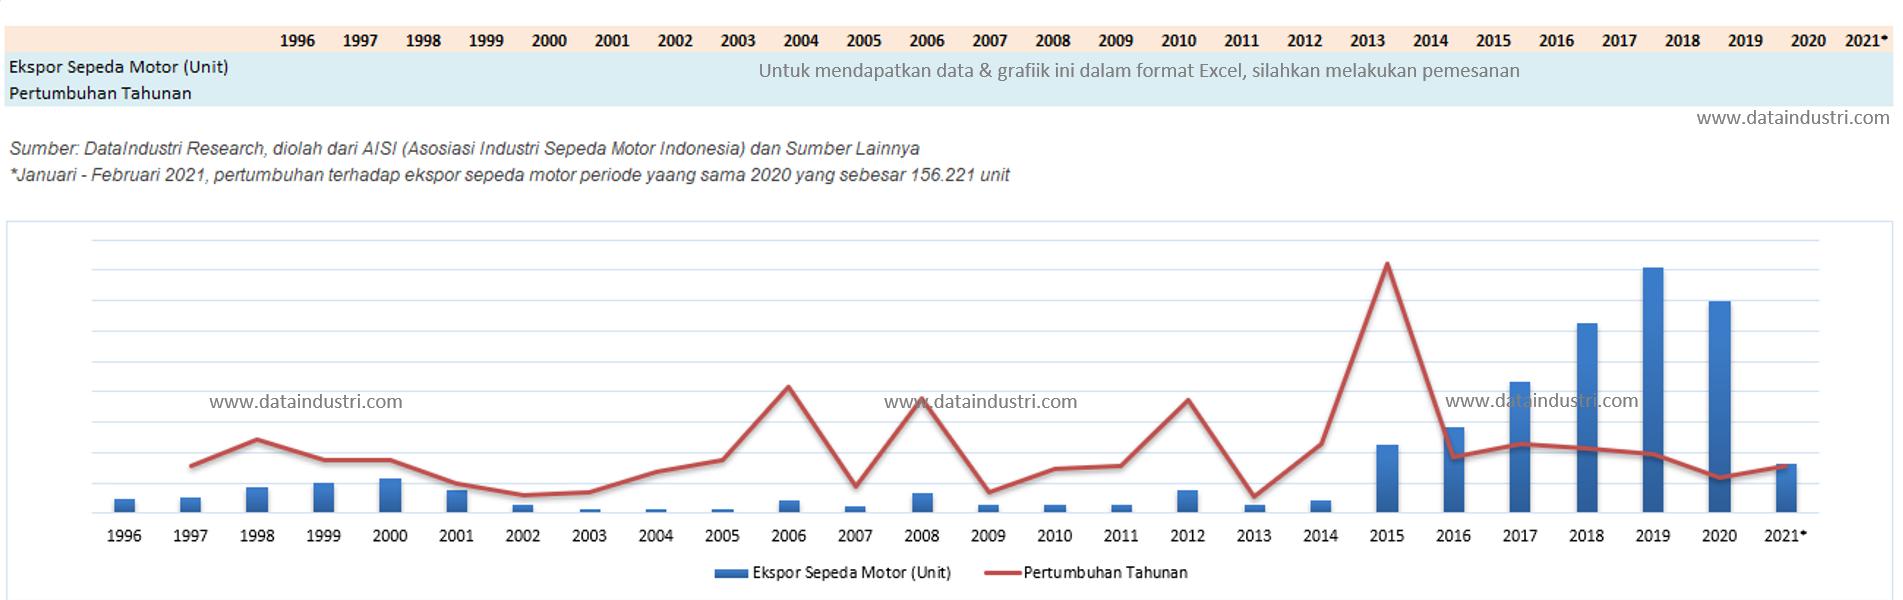 Tren Data Penjualan Ekspor Sepeda Motor Indonesia, 1996 – 2021